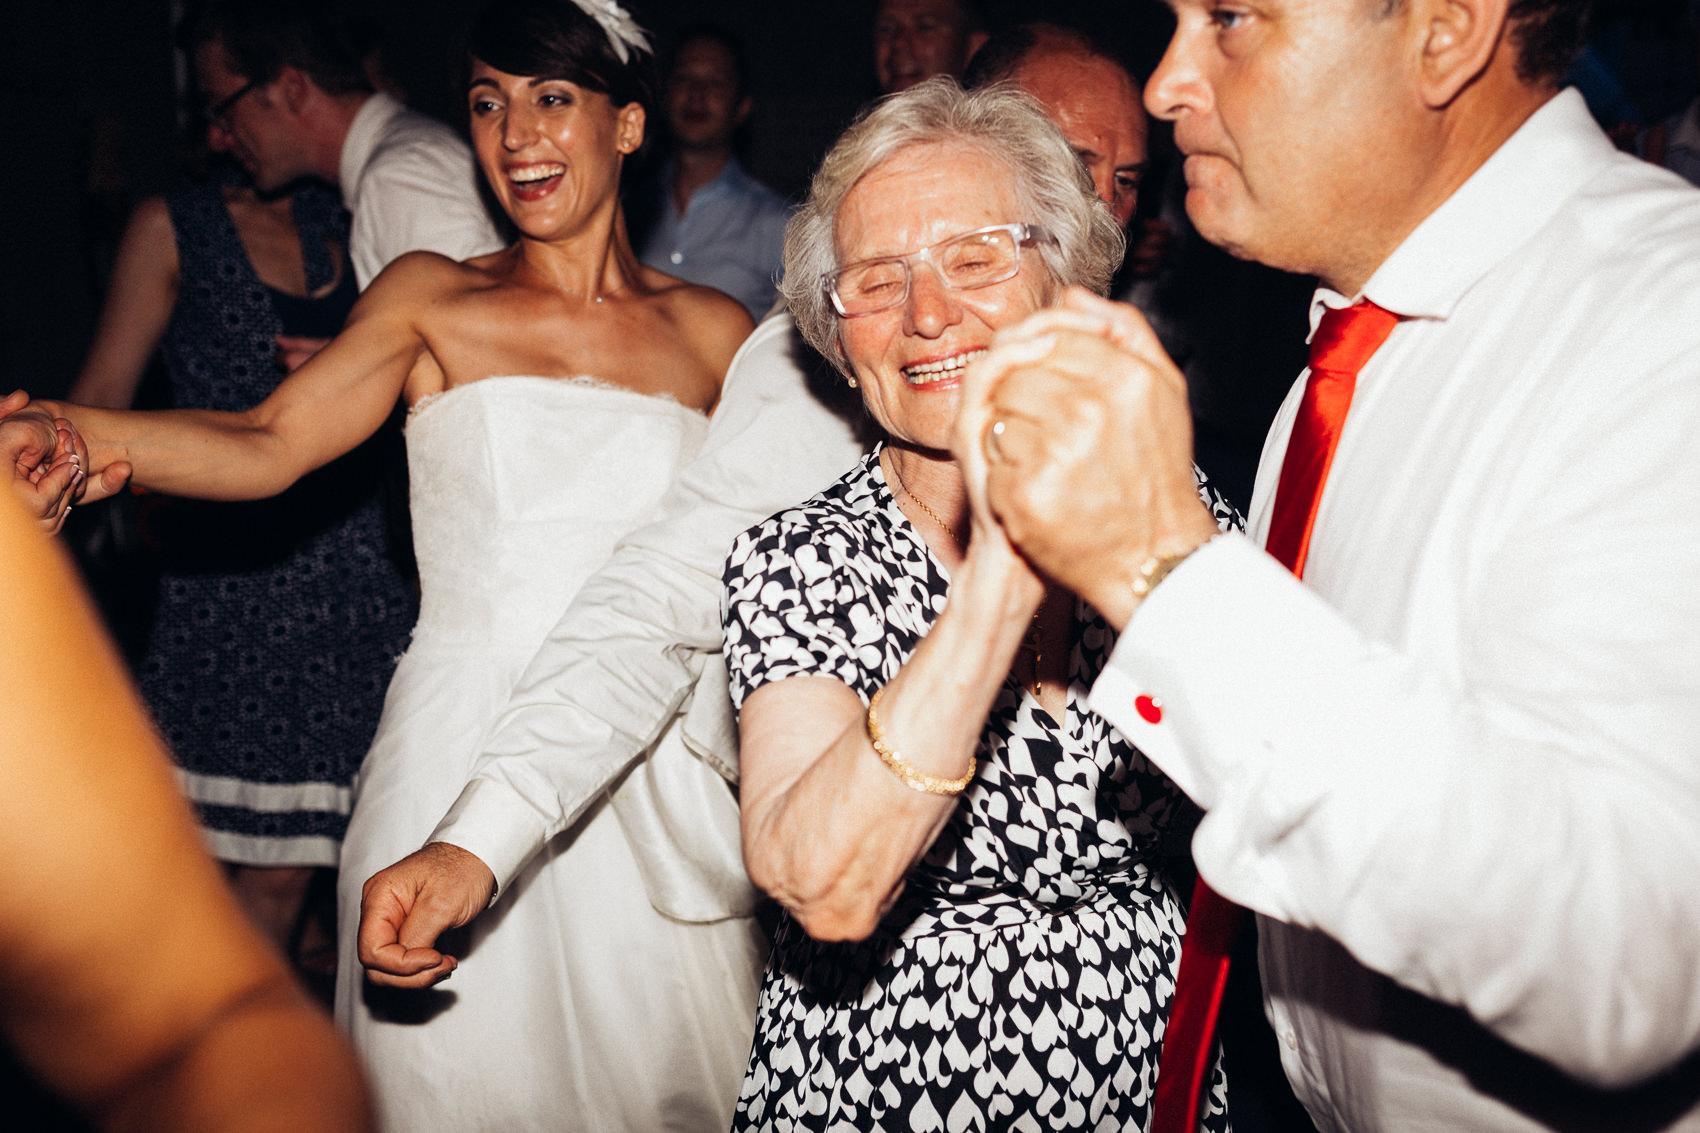 mariage-charlotte-et-joel-trendzphotography-124